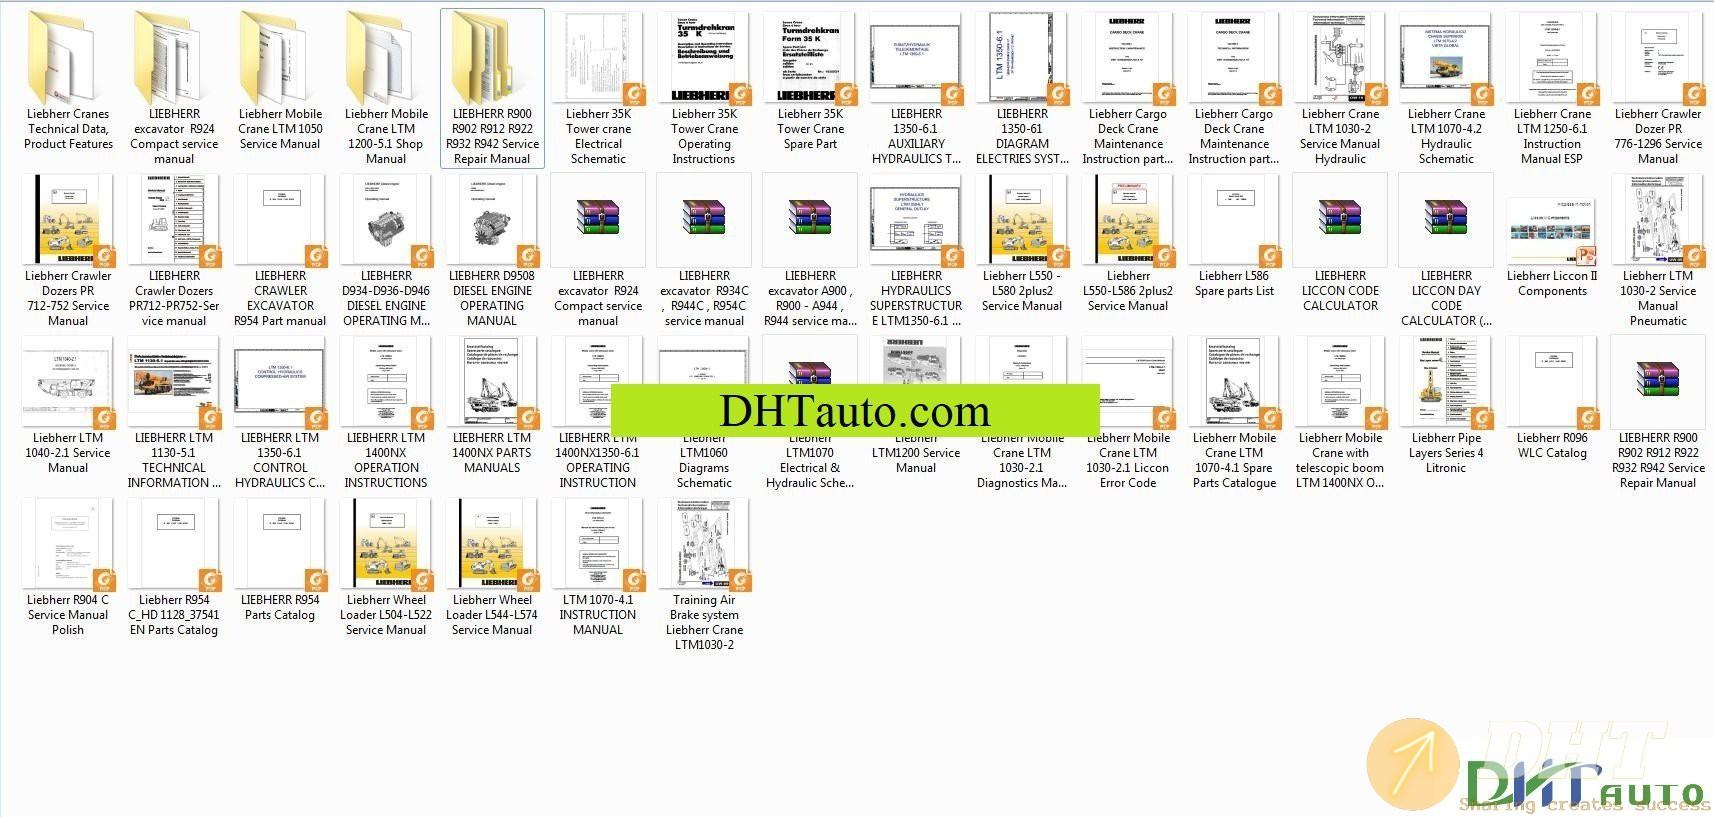 Liebherr-Machine-Crane-Service-Operating-Manual.jpg